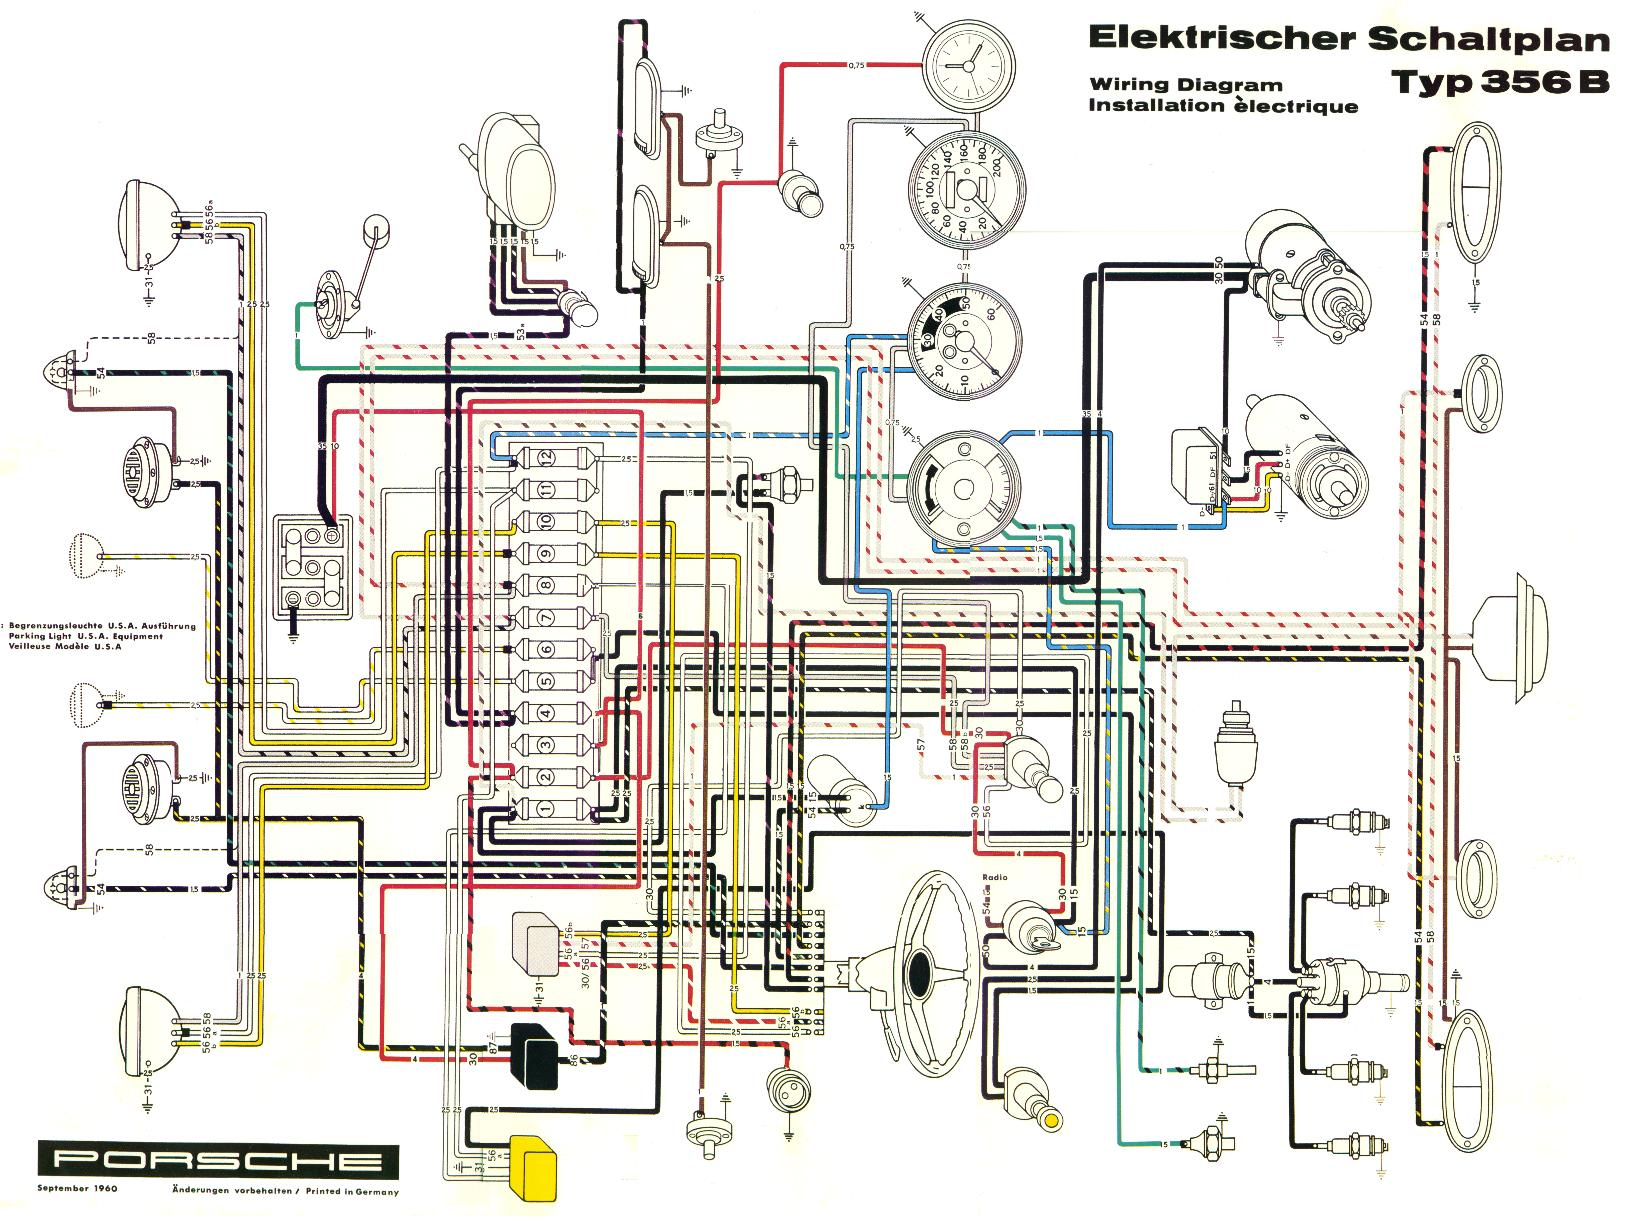 1967 Porsche 912 Wiring Diagram Best Secret Power Window Switch Or Relay Help Pelican Parts Technical Bbs 911 Factory Color Third Rh 20 Jacobwinterstein Com